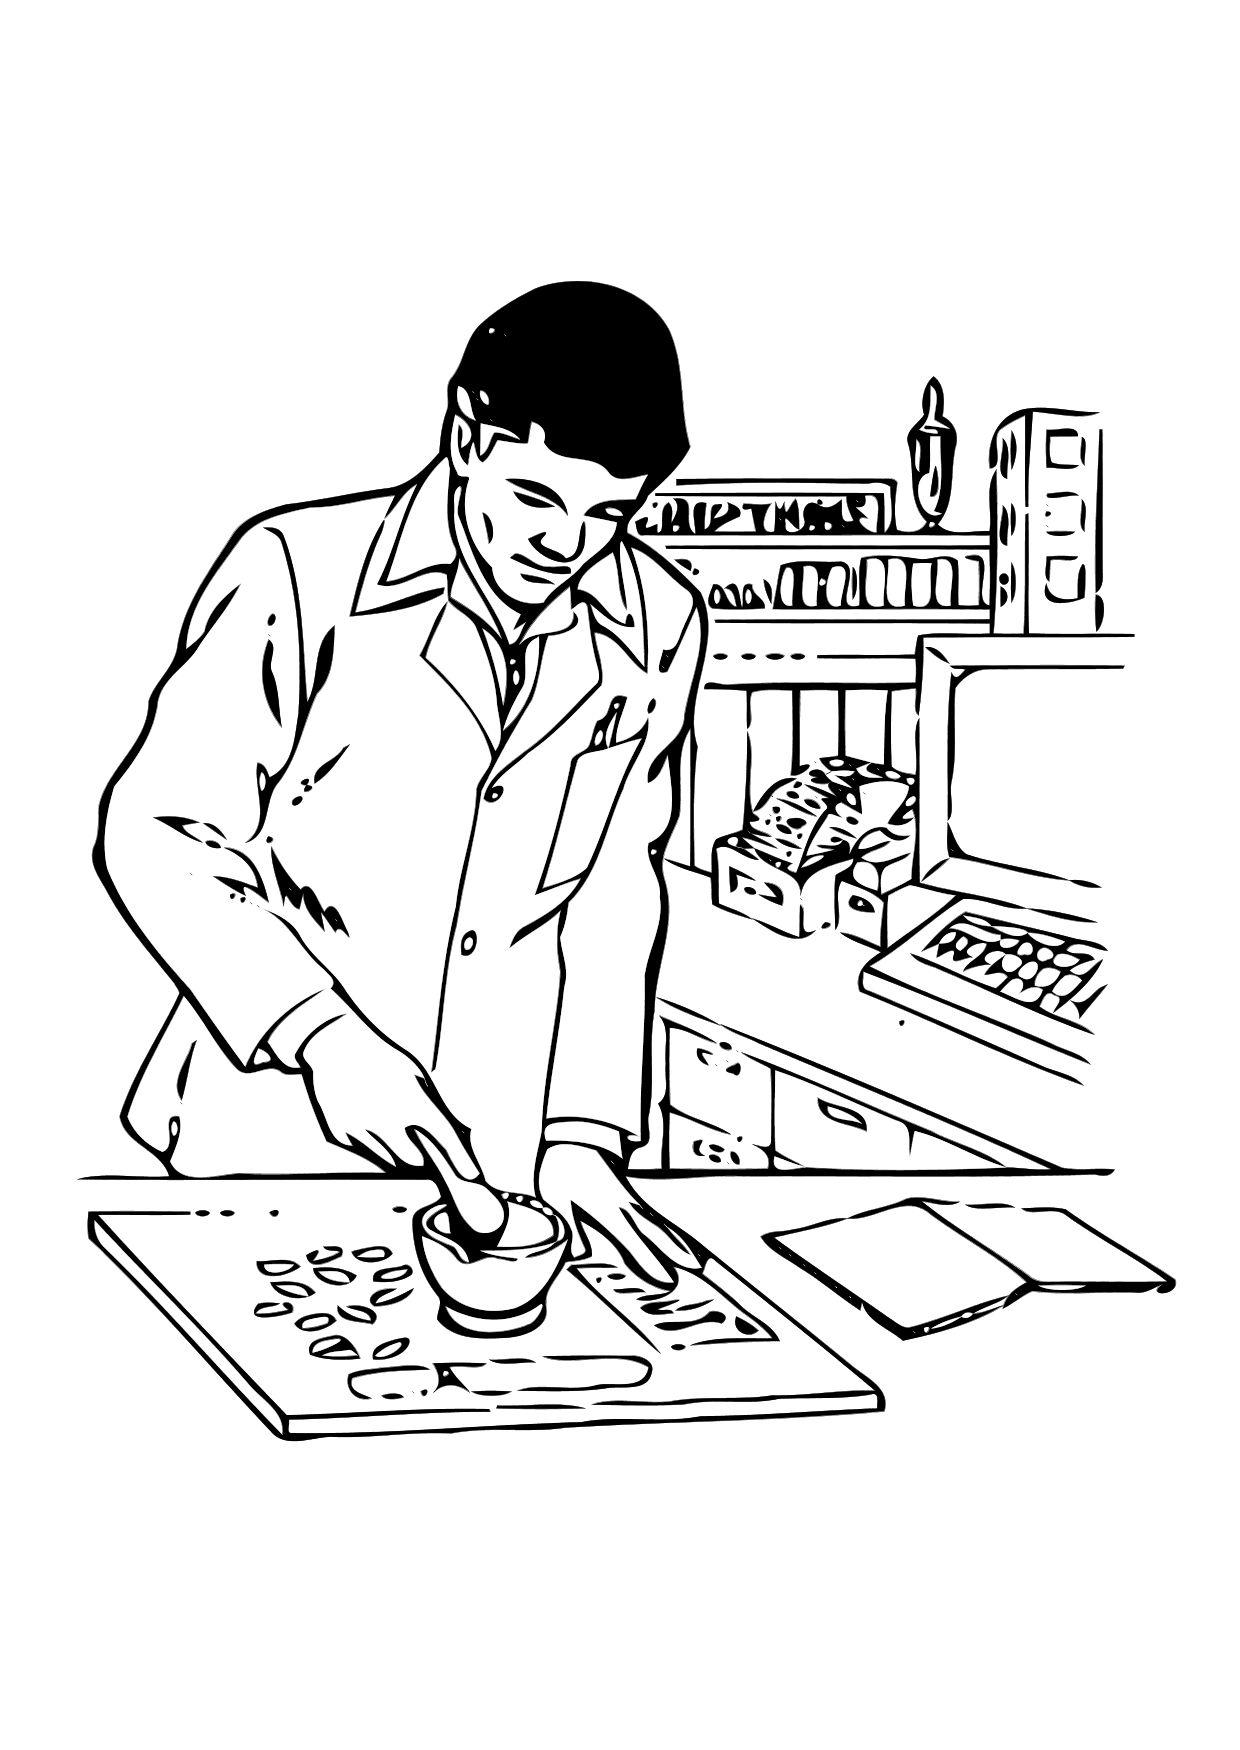 Dibujo Para Colorear Farmaceãºtico Img 11302 Images